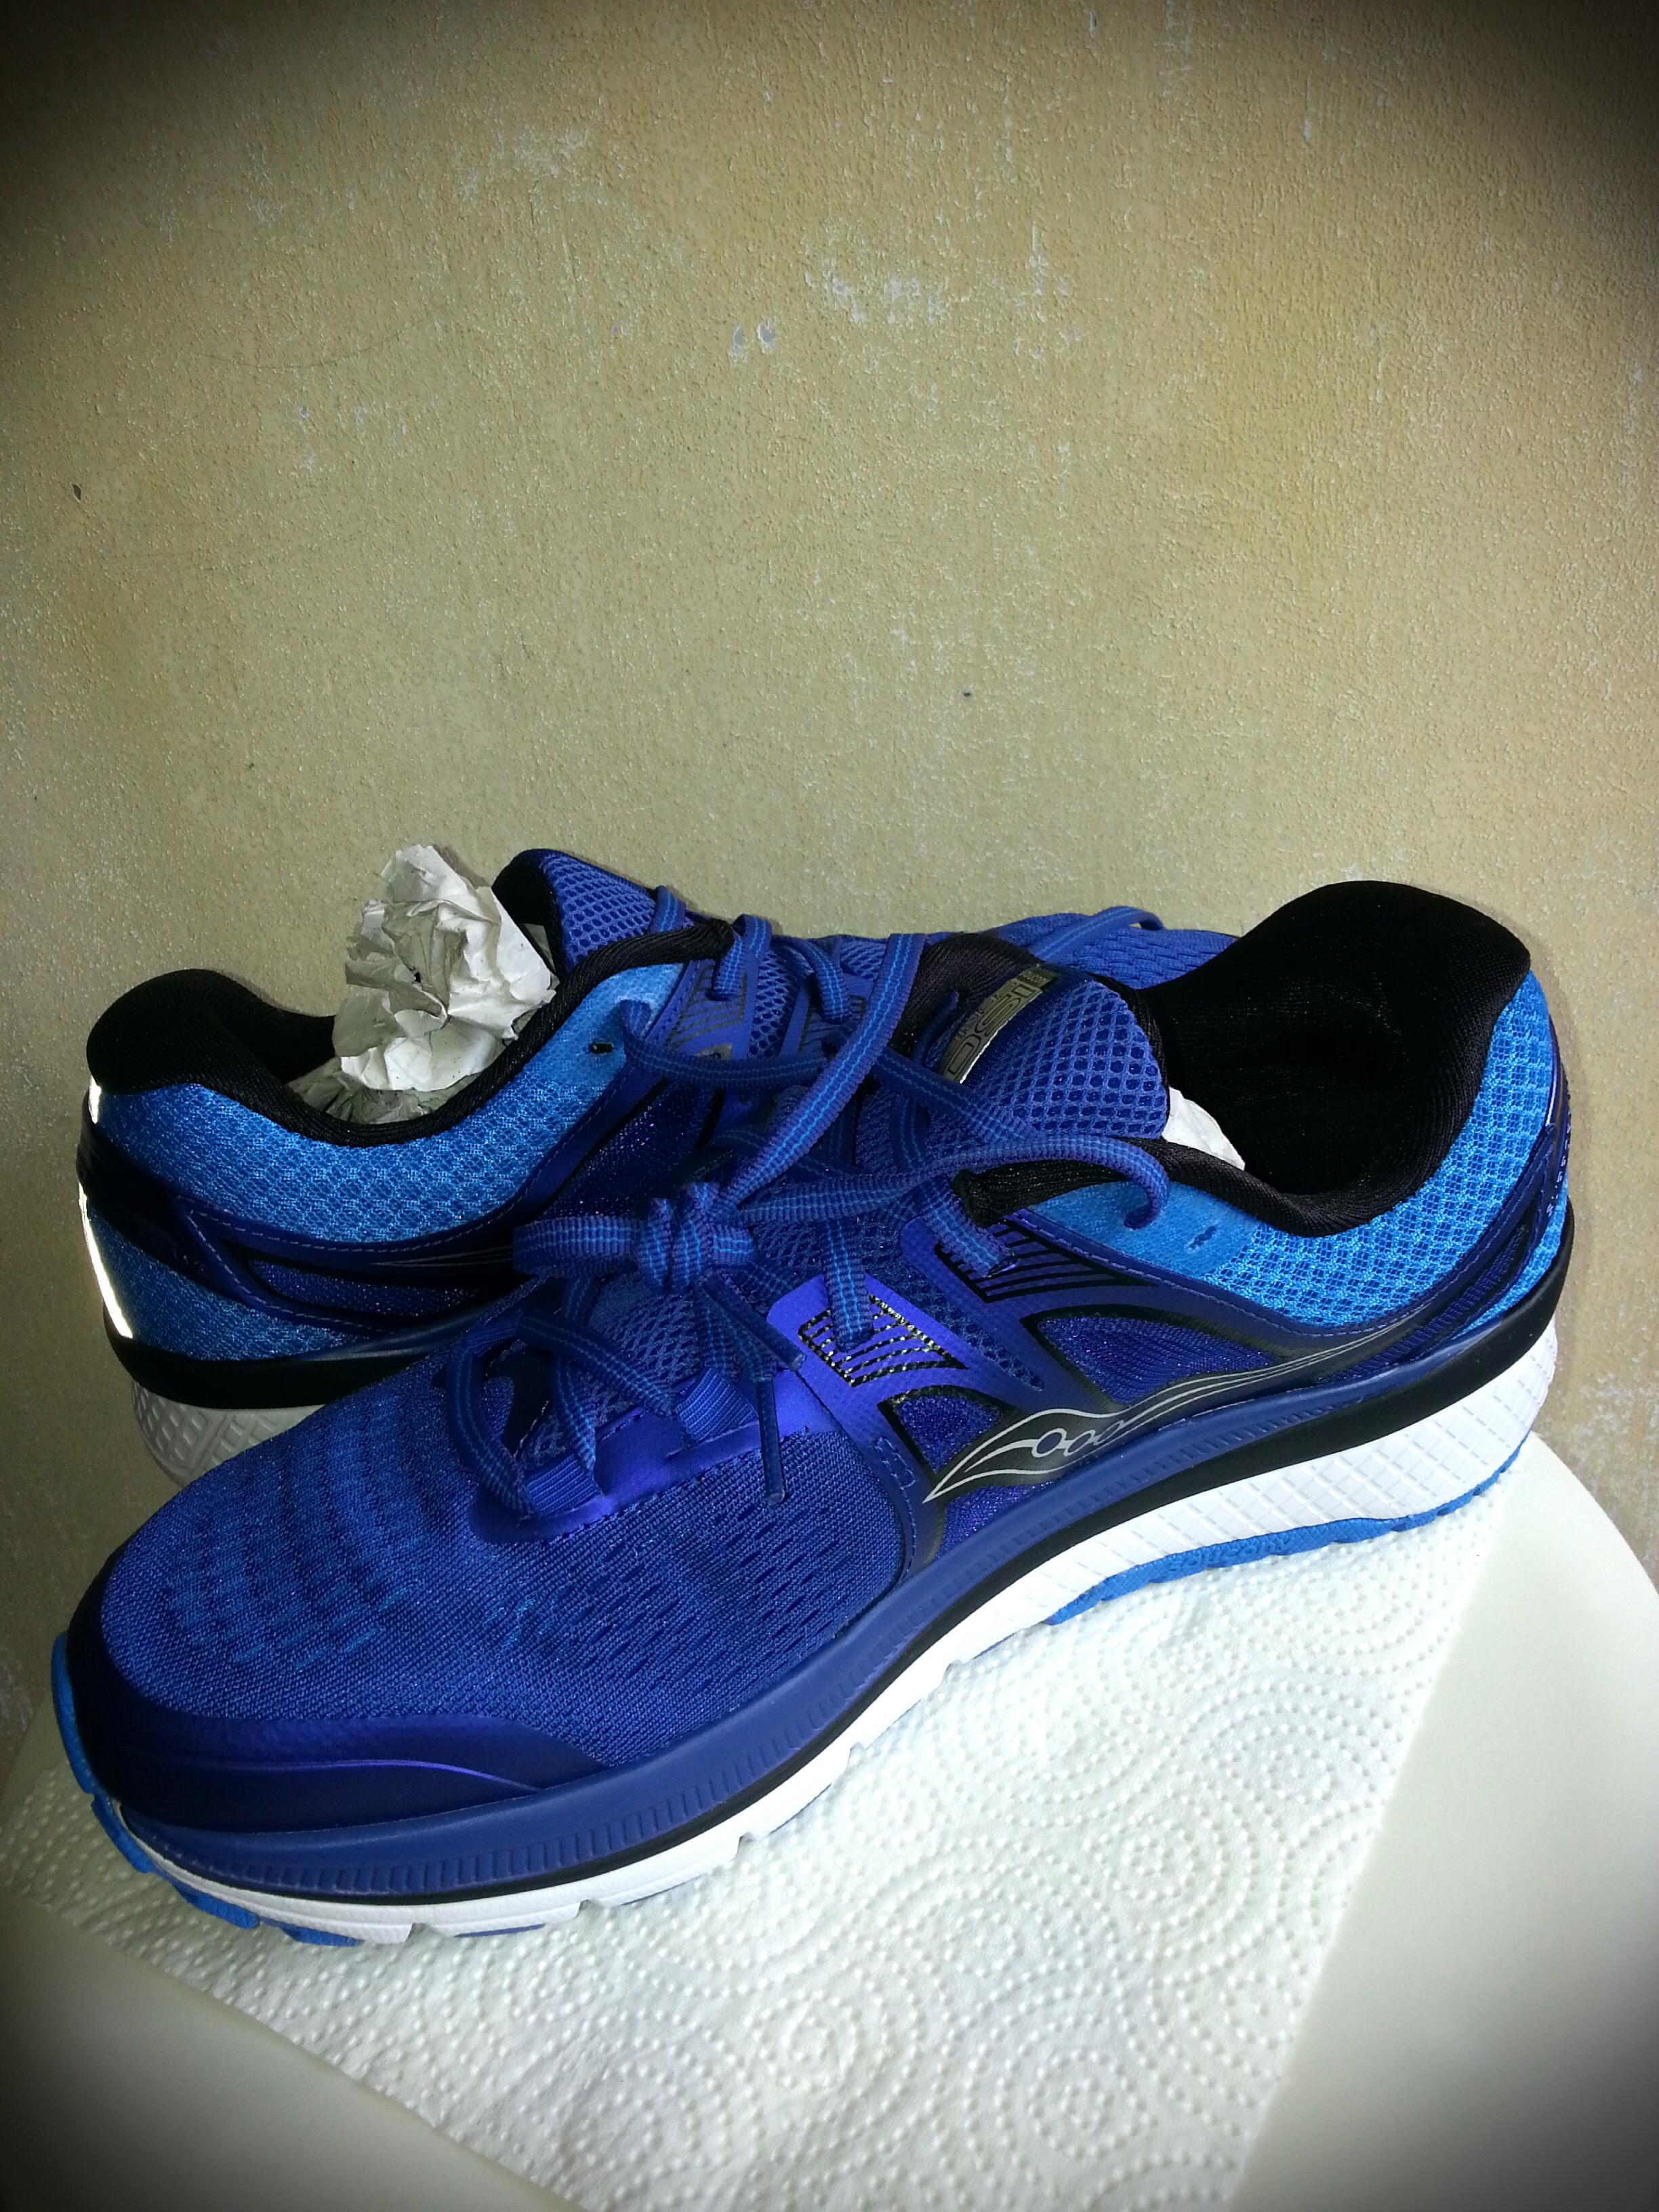 43e0cd9c51 SALE! BN Saucony Triumph ISO 3 Running Shoe (US Size 9.5) Wide